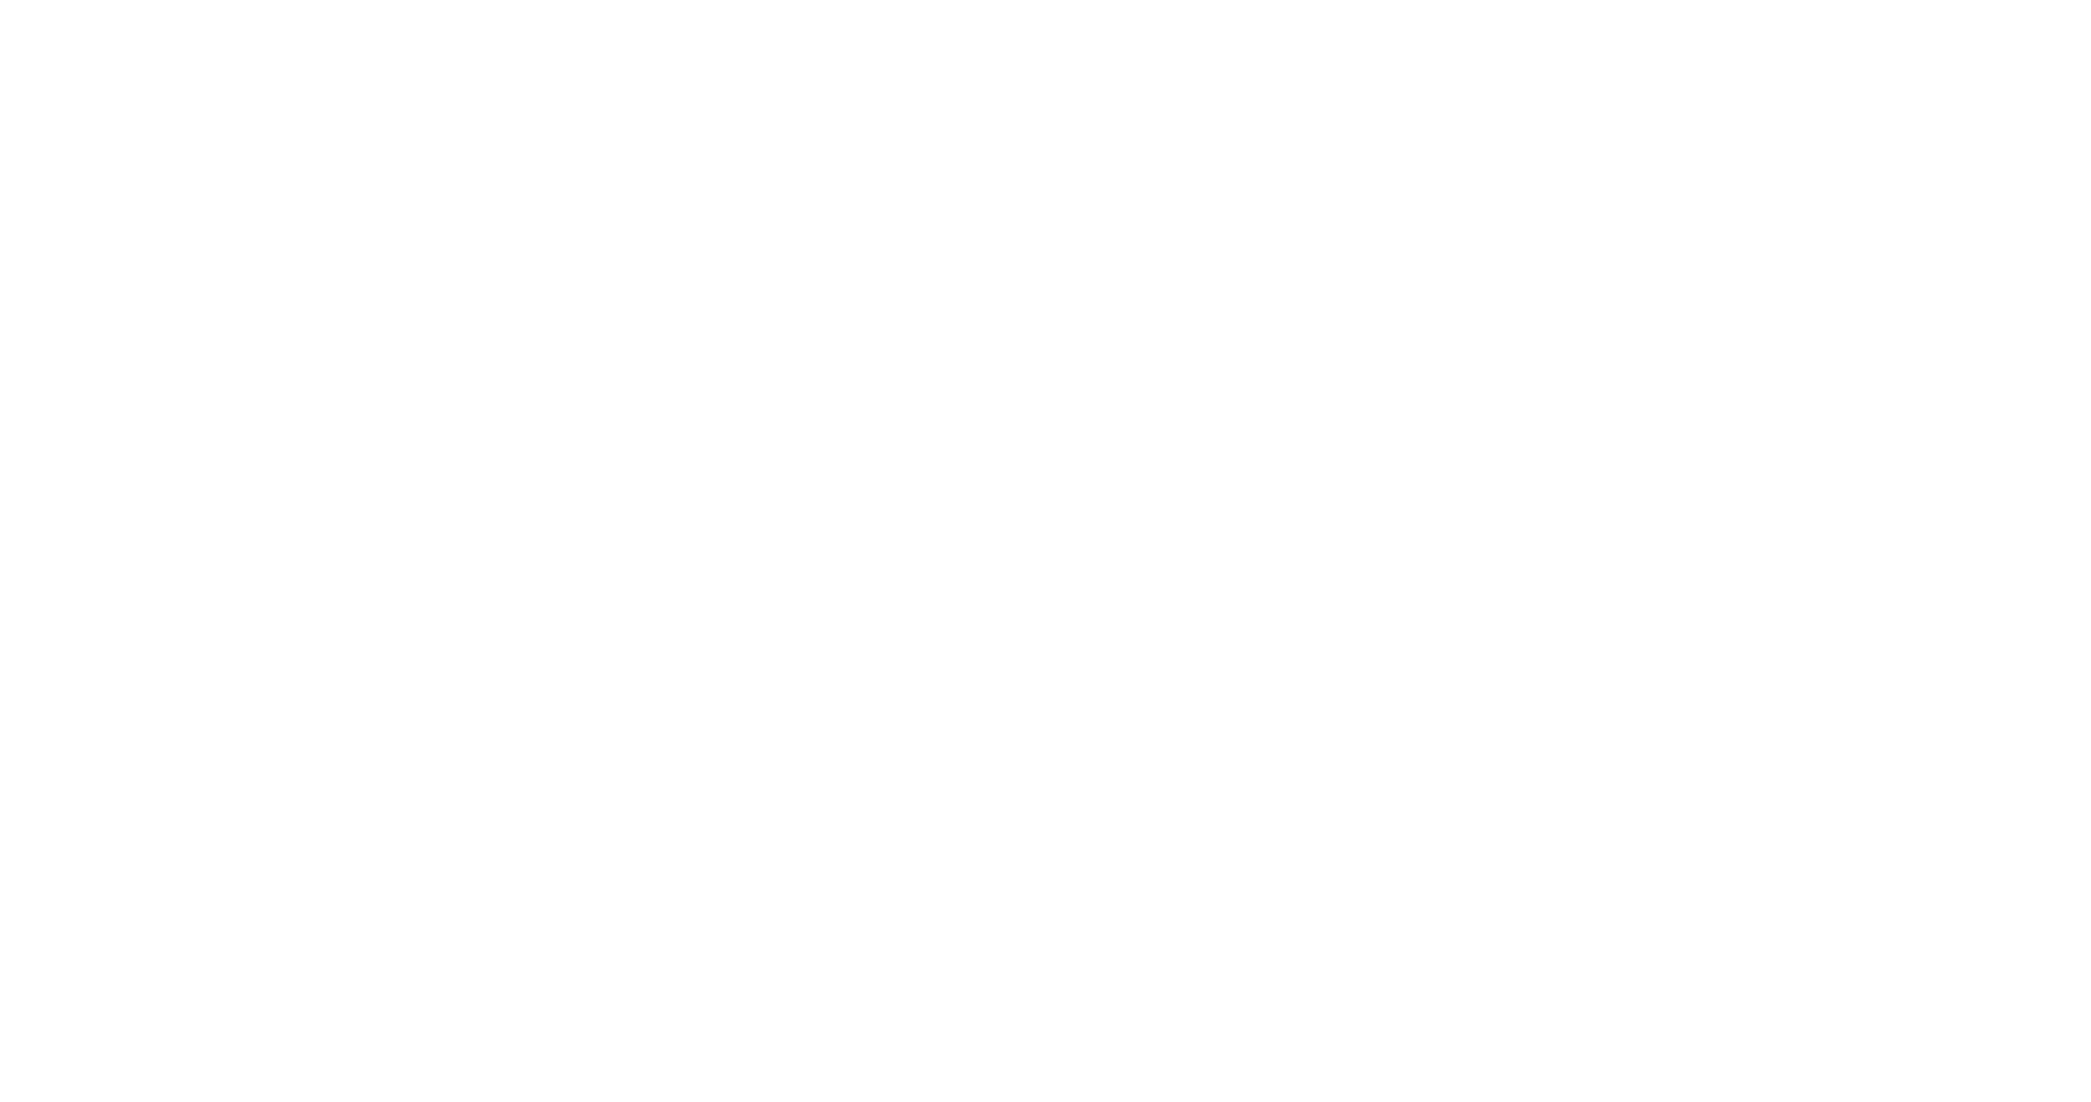 smoke_heads_white.png